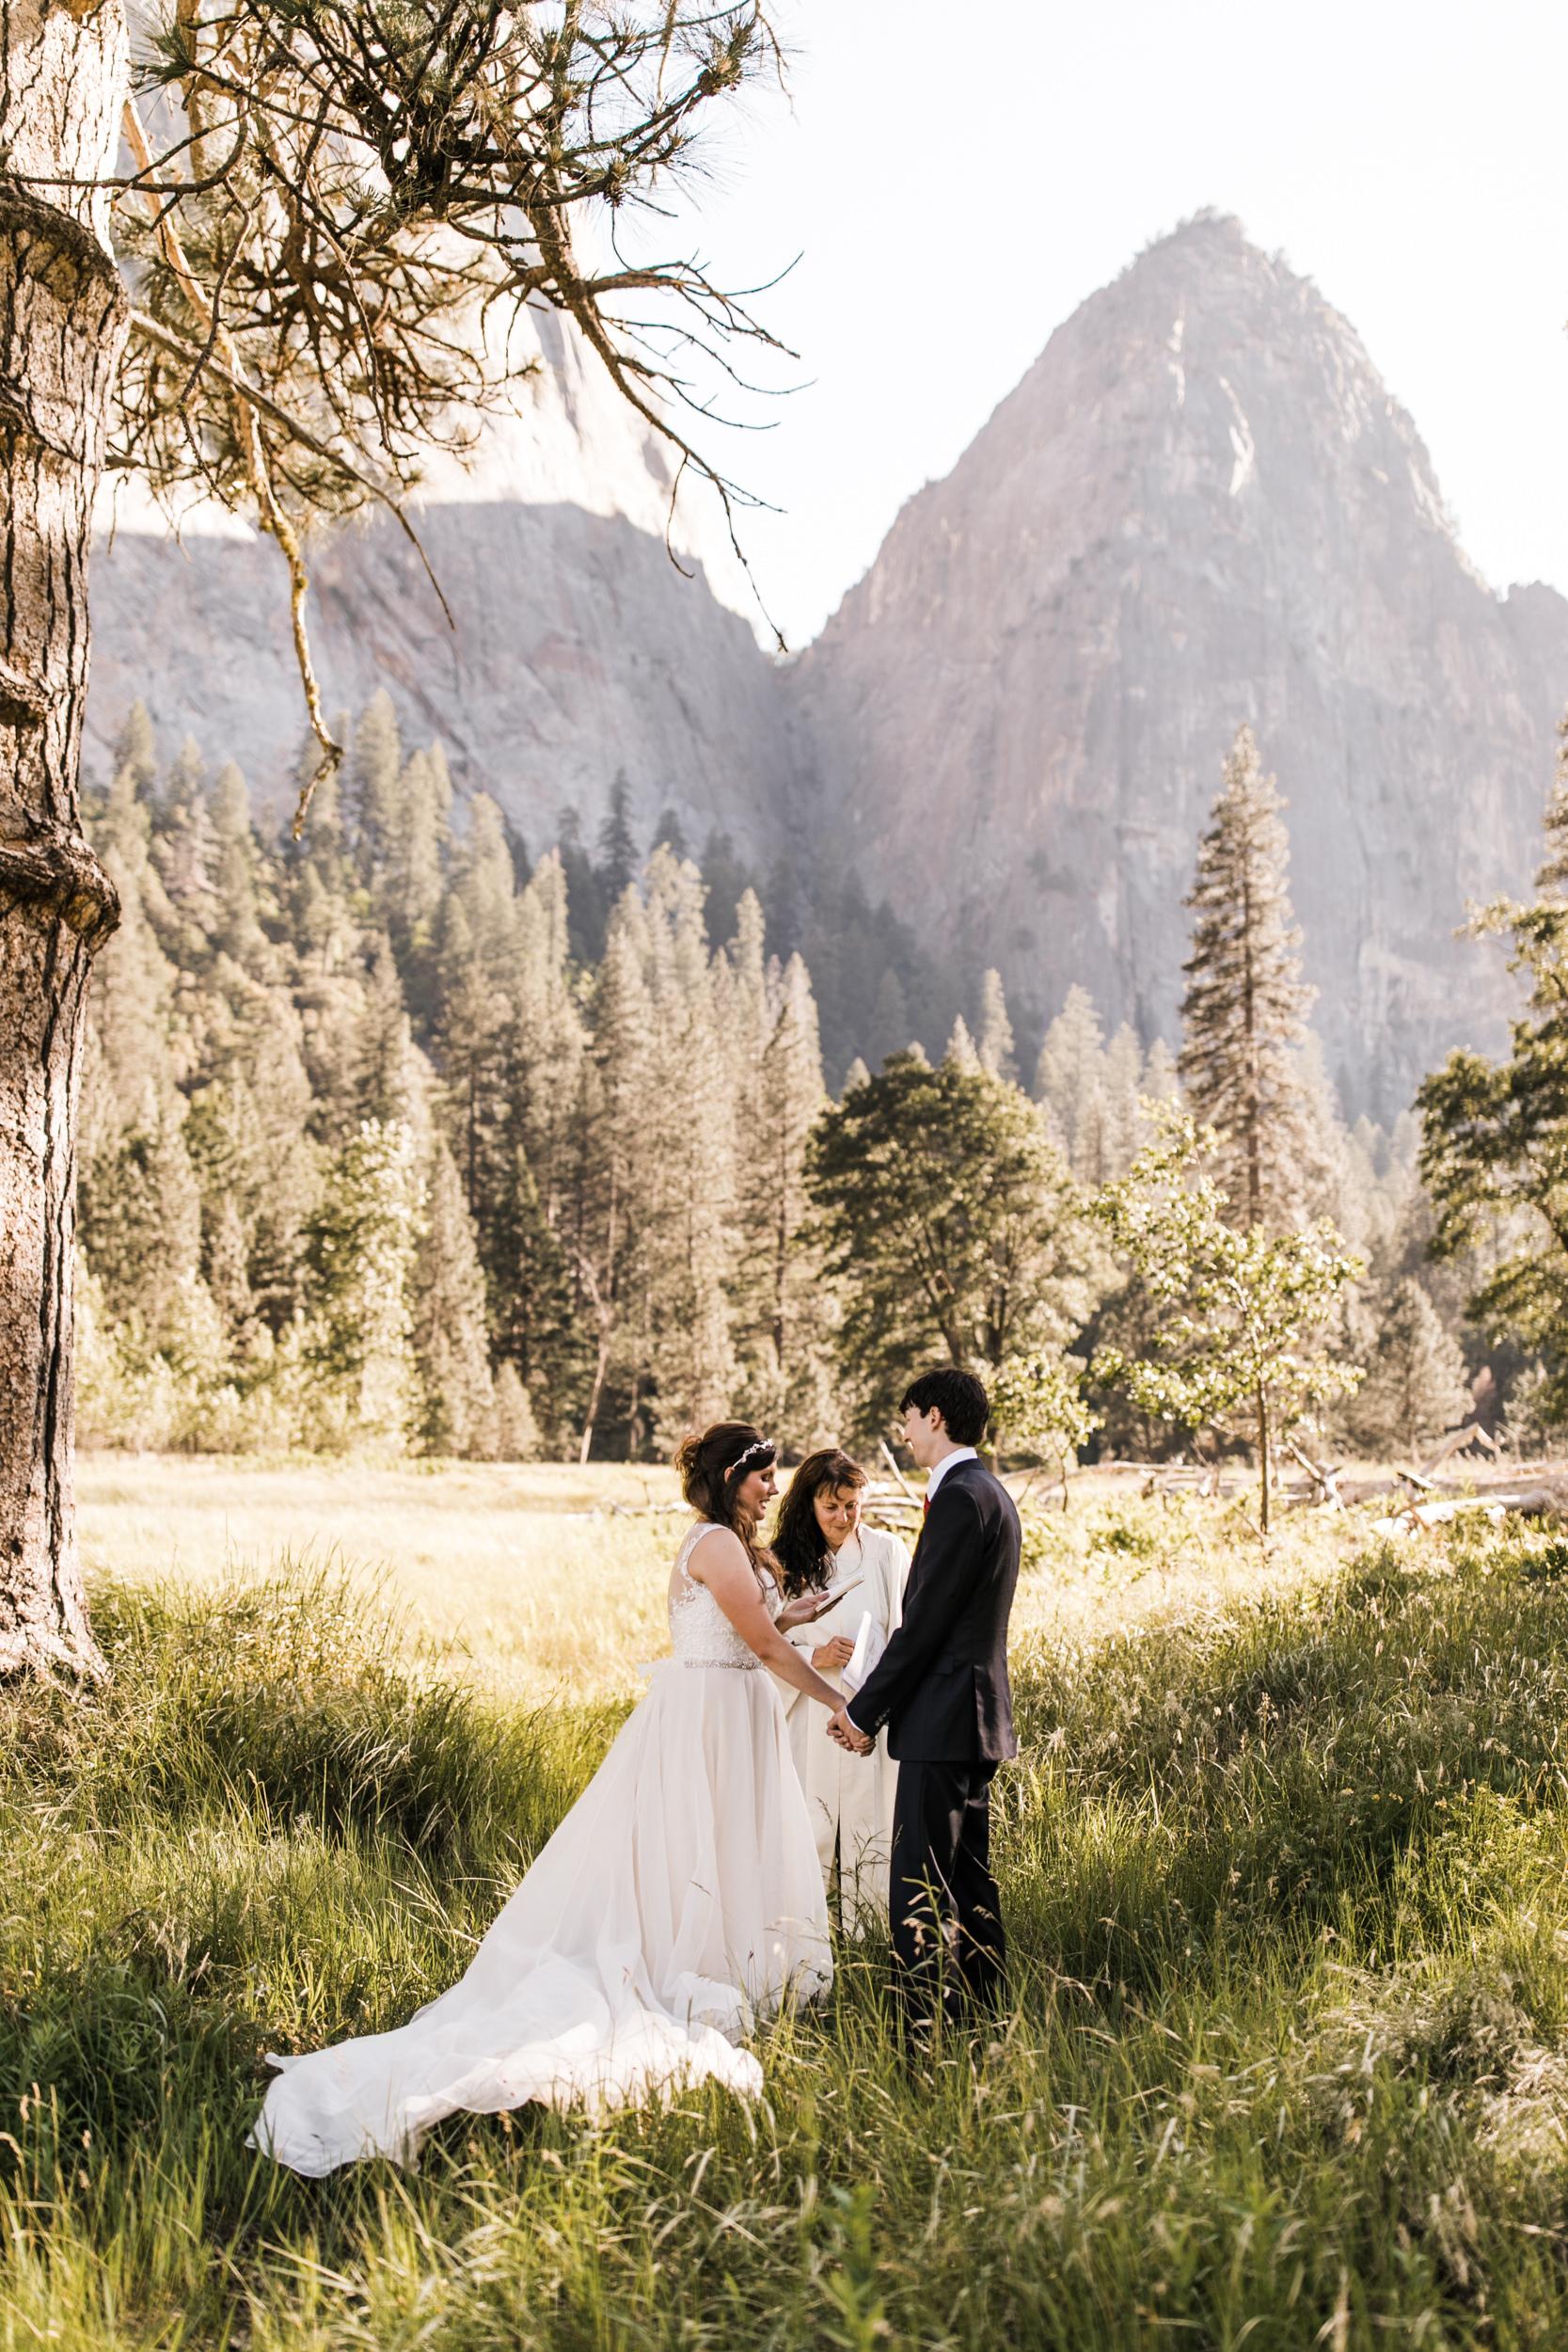 Yosemite-National-Park-Wedding-Photographer-Adventure-Wedding-Photos-Hearnes-Elopement-Photography-El-Cap-Meadow-Ceremony-Glacier-Point-Sunset-14.jpg